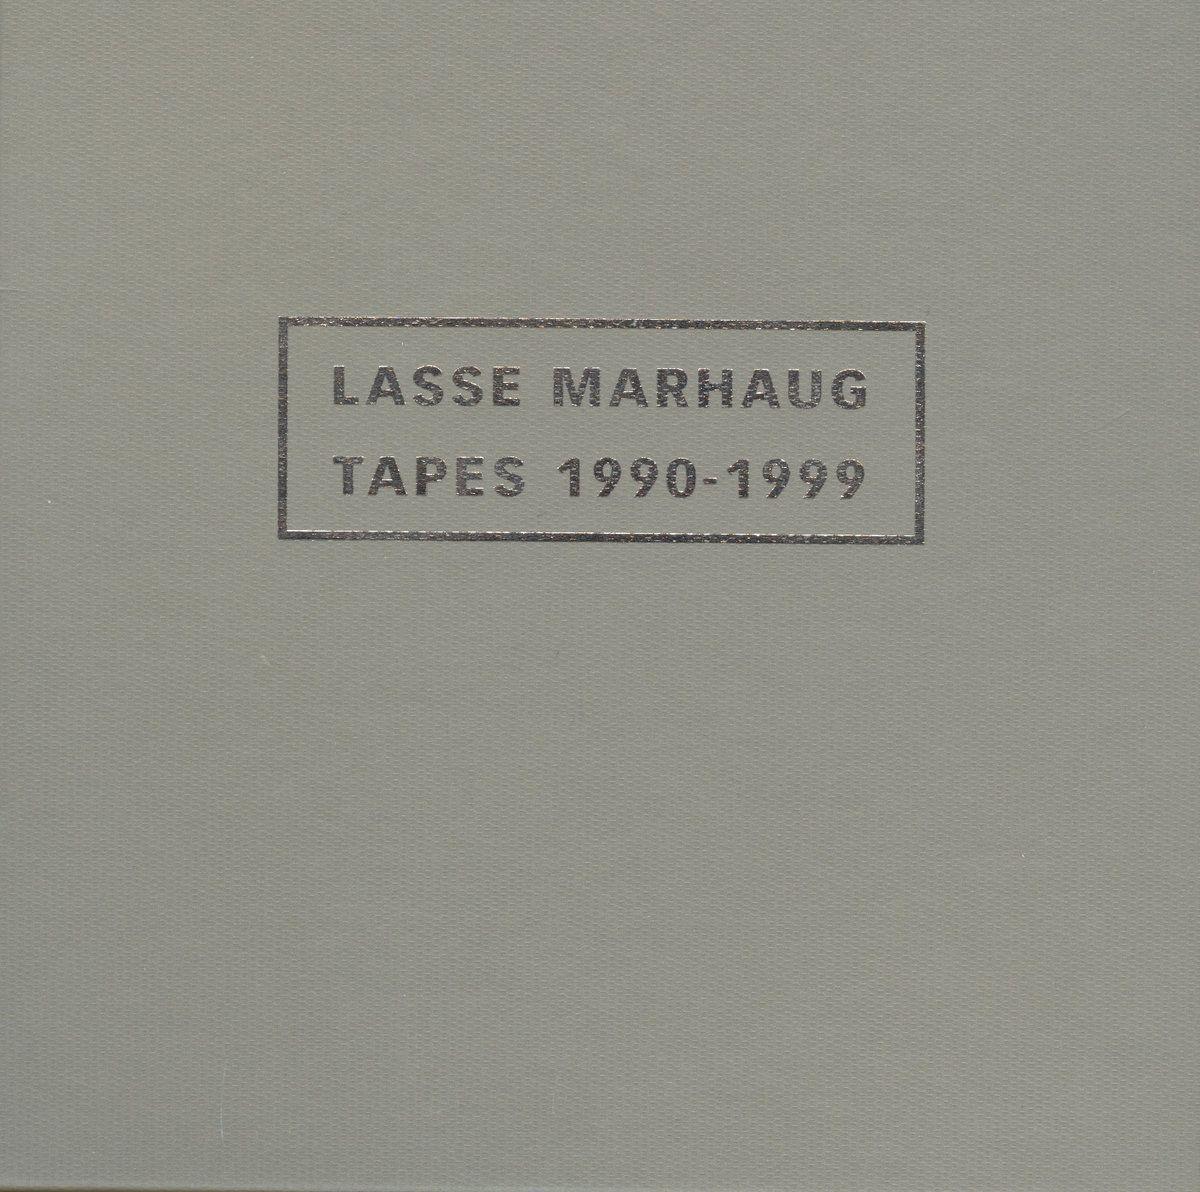 Lasse Marhaug - Tapes 1990-1999